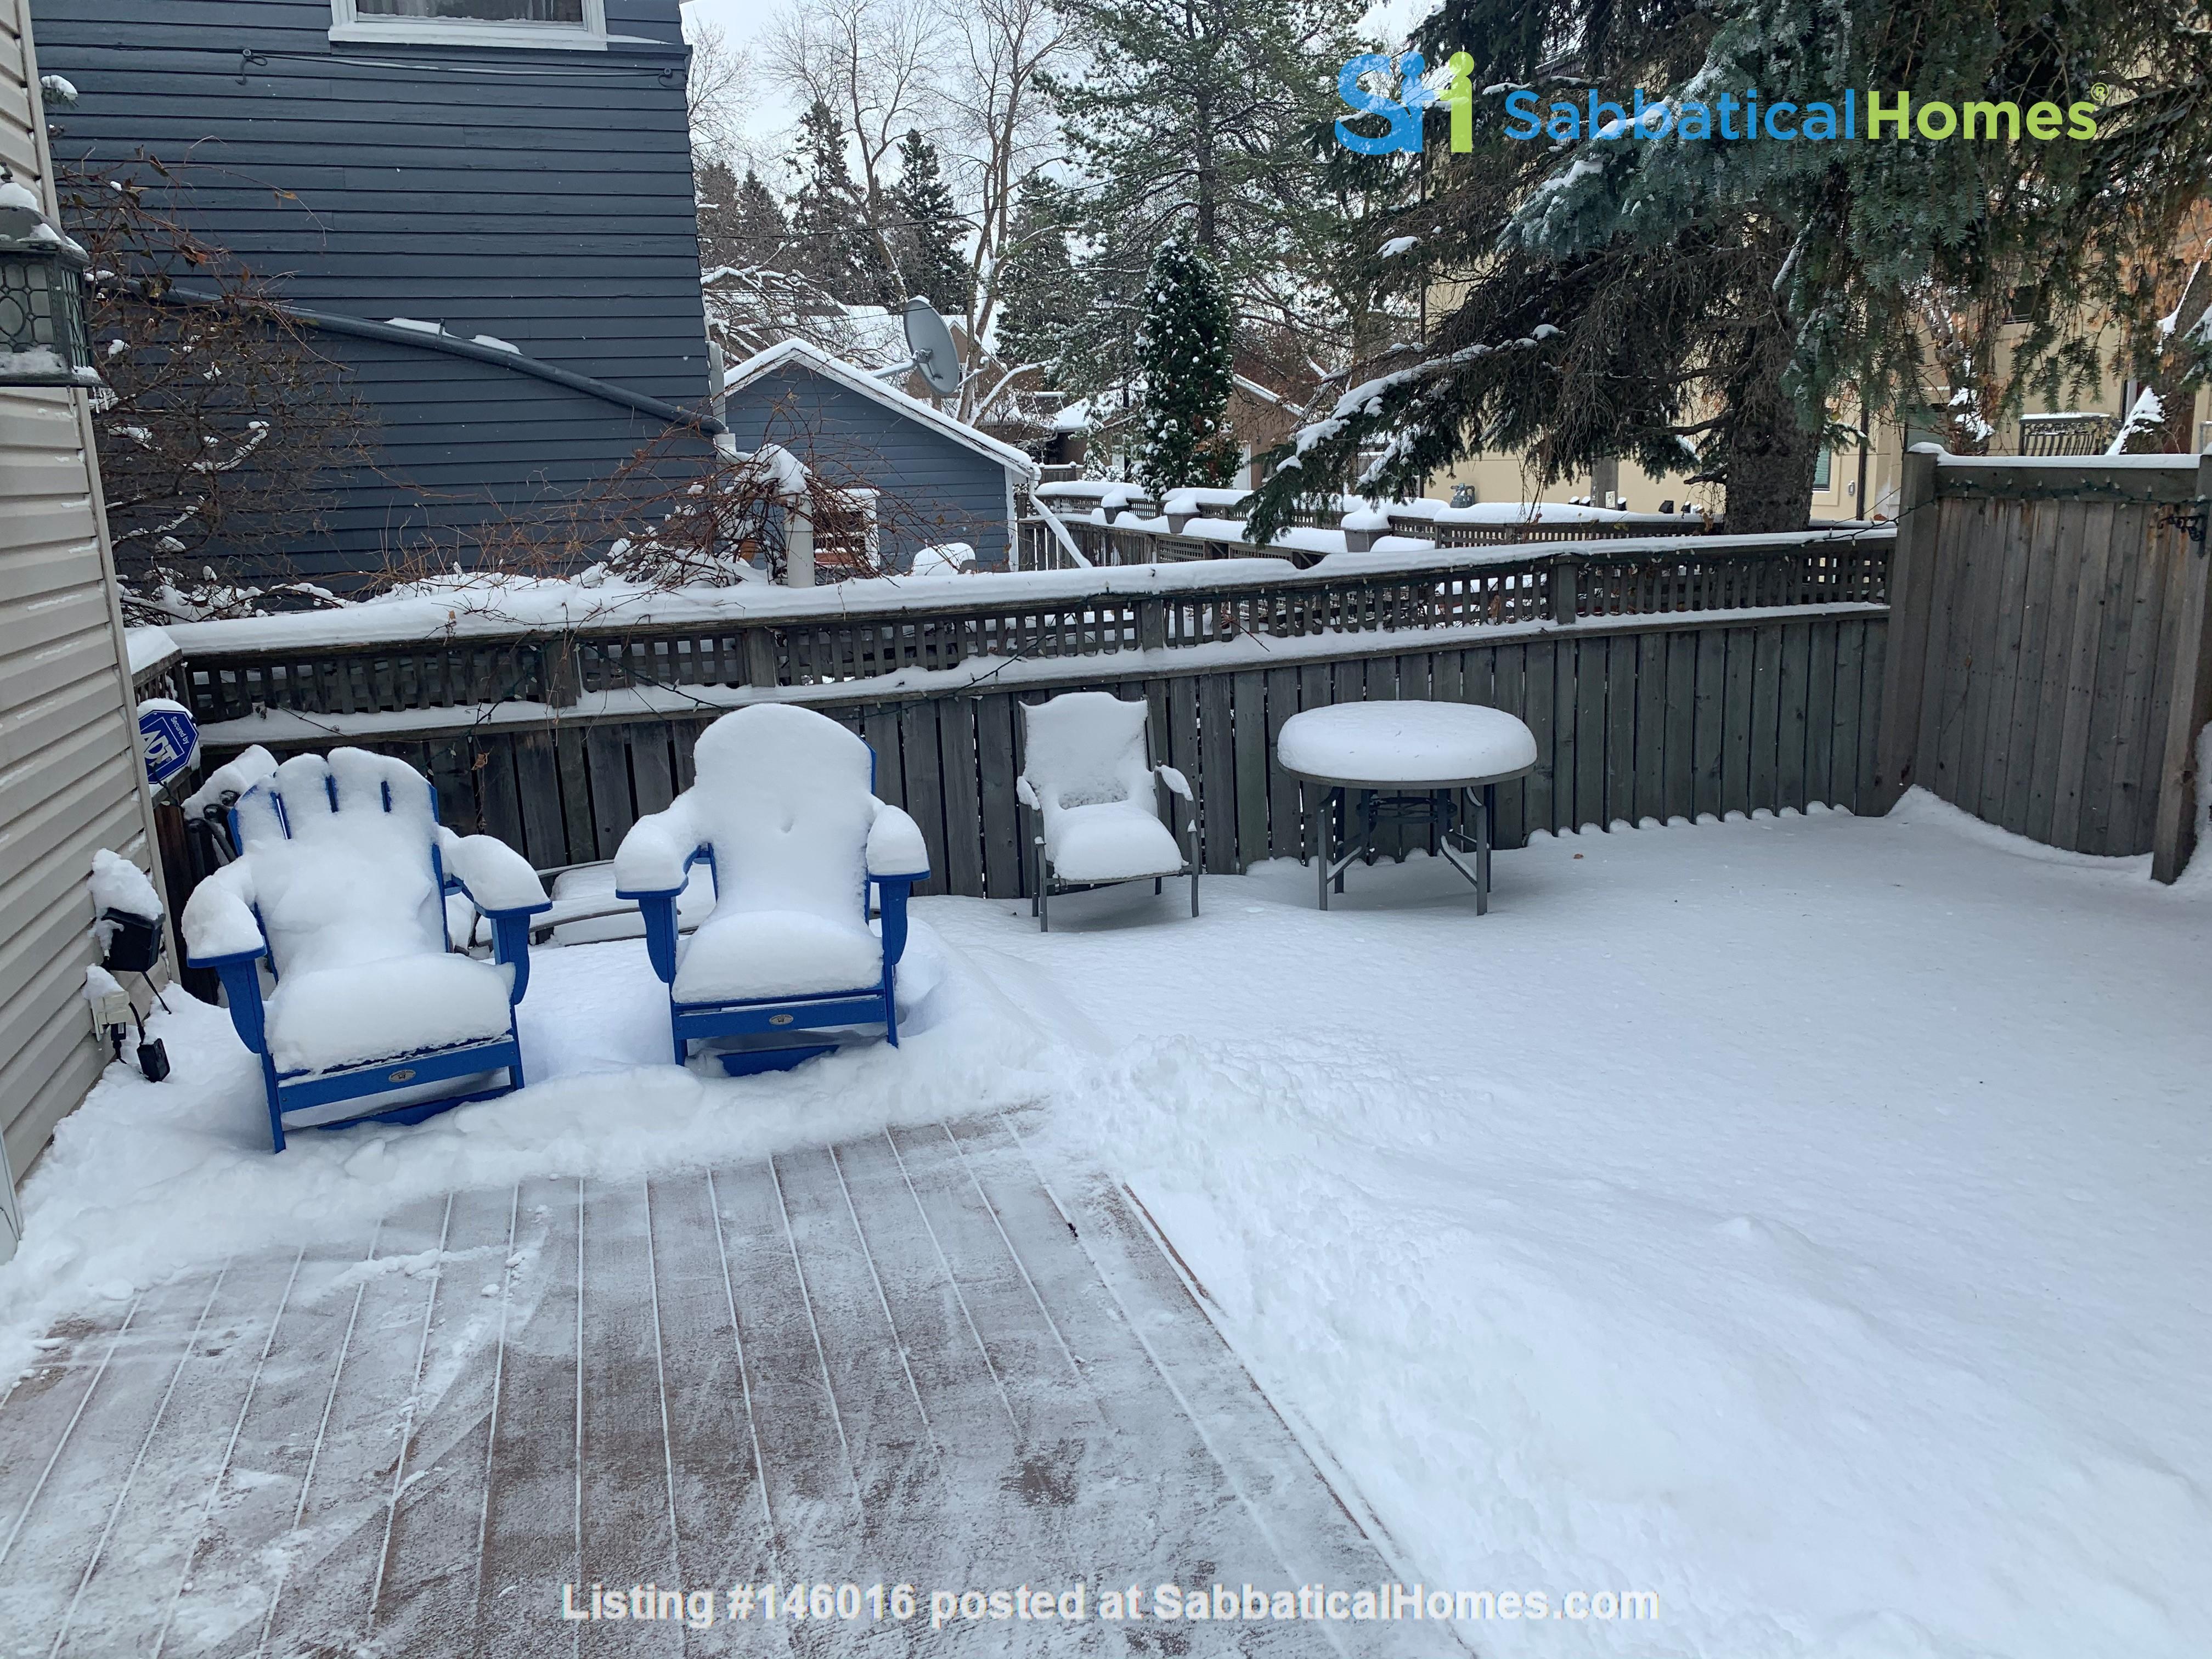 Forest haven sabbatical home Home Rental in Edmonton 7